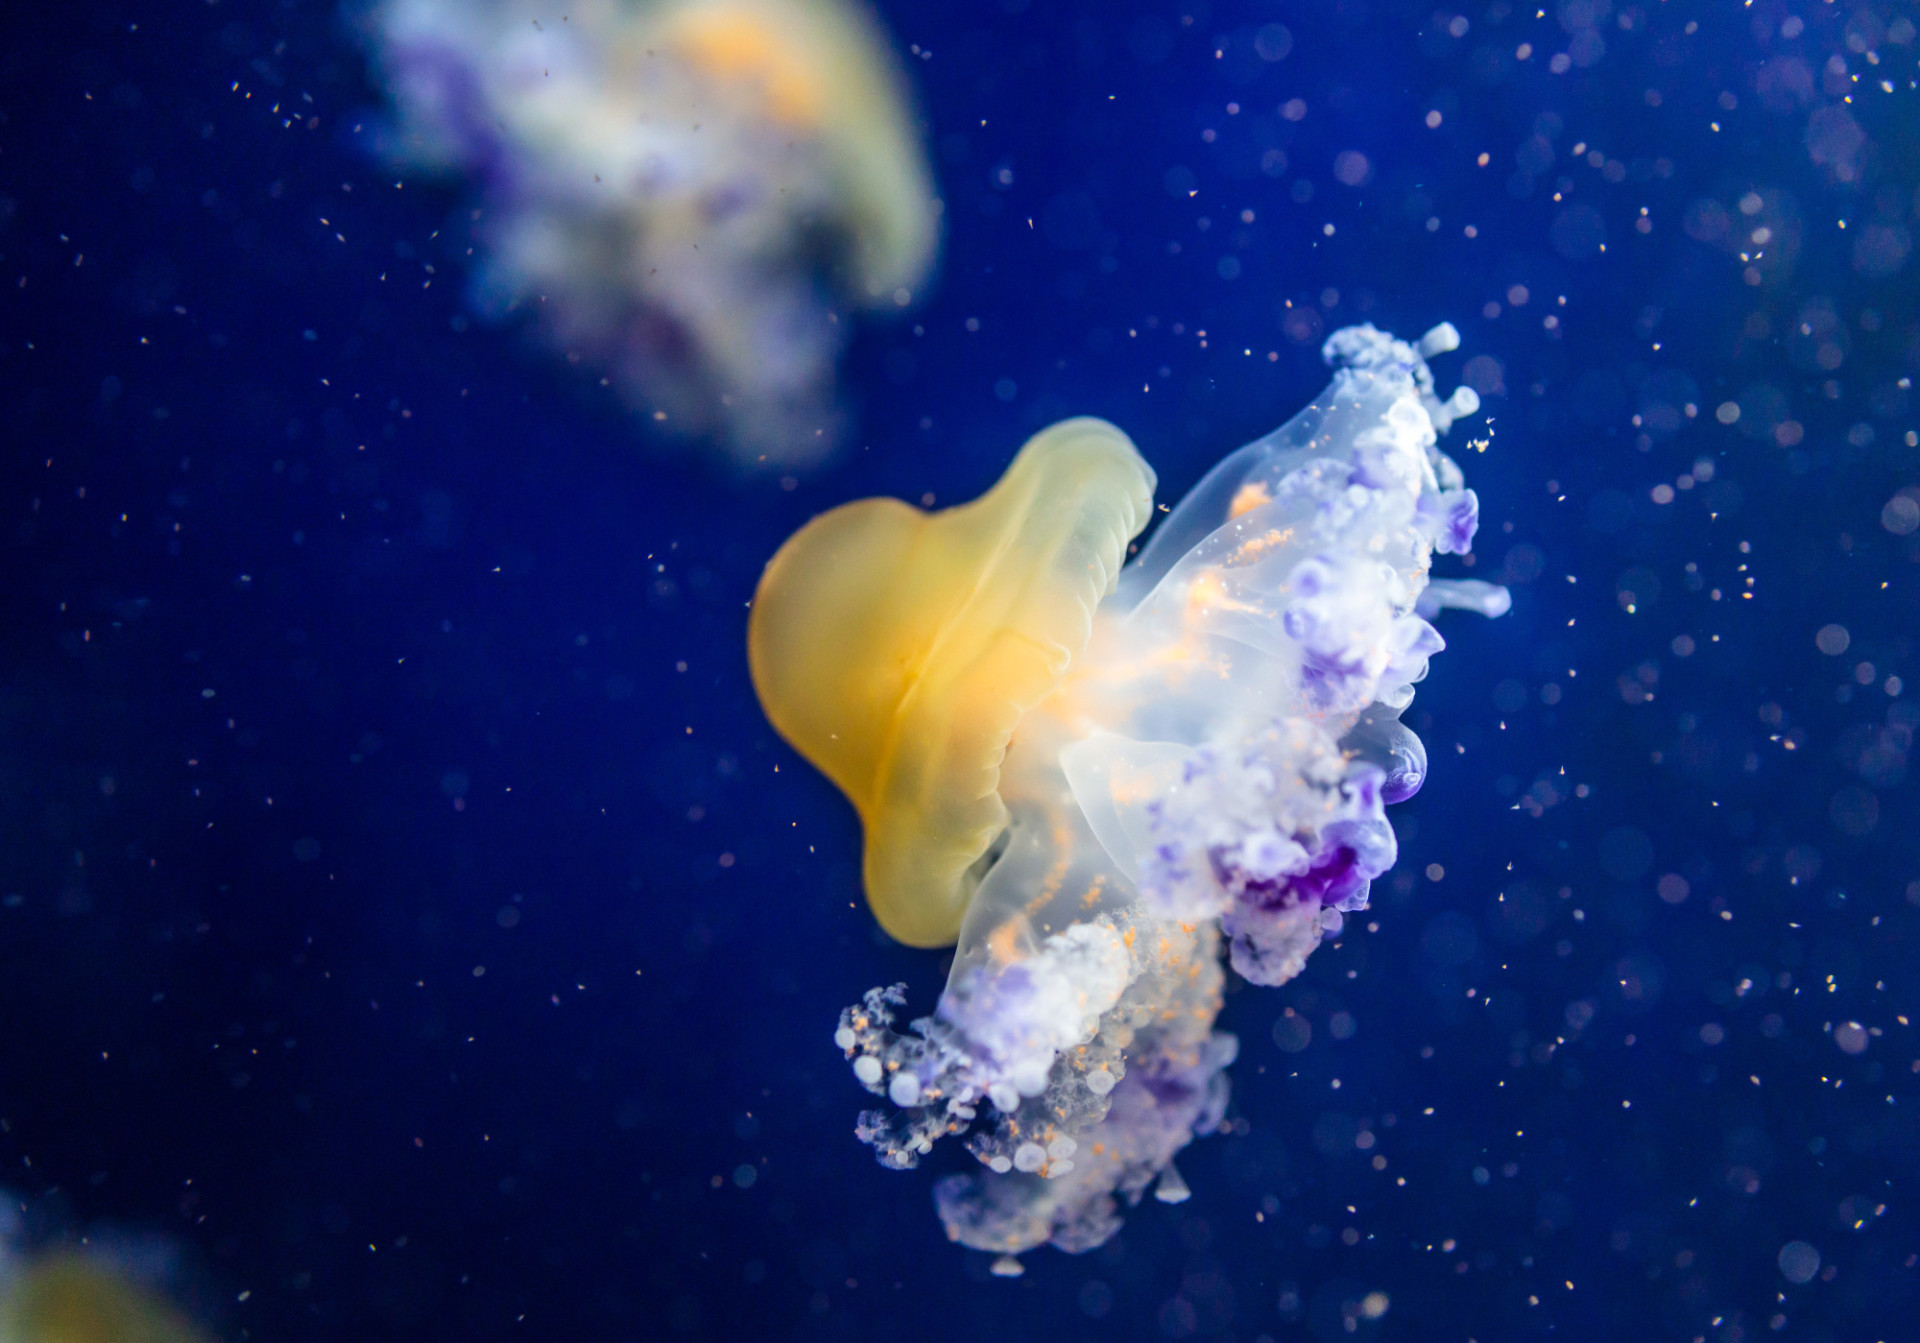 Cotylorhiza tuberculata a species of jellyfish, of the phylum Cnidaria.